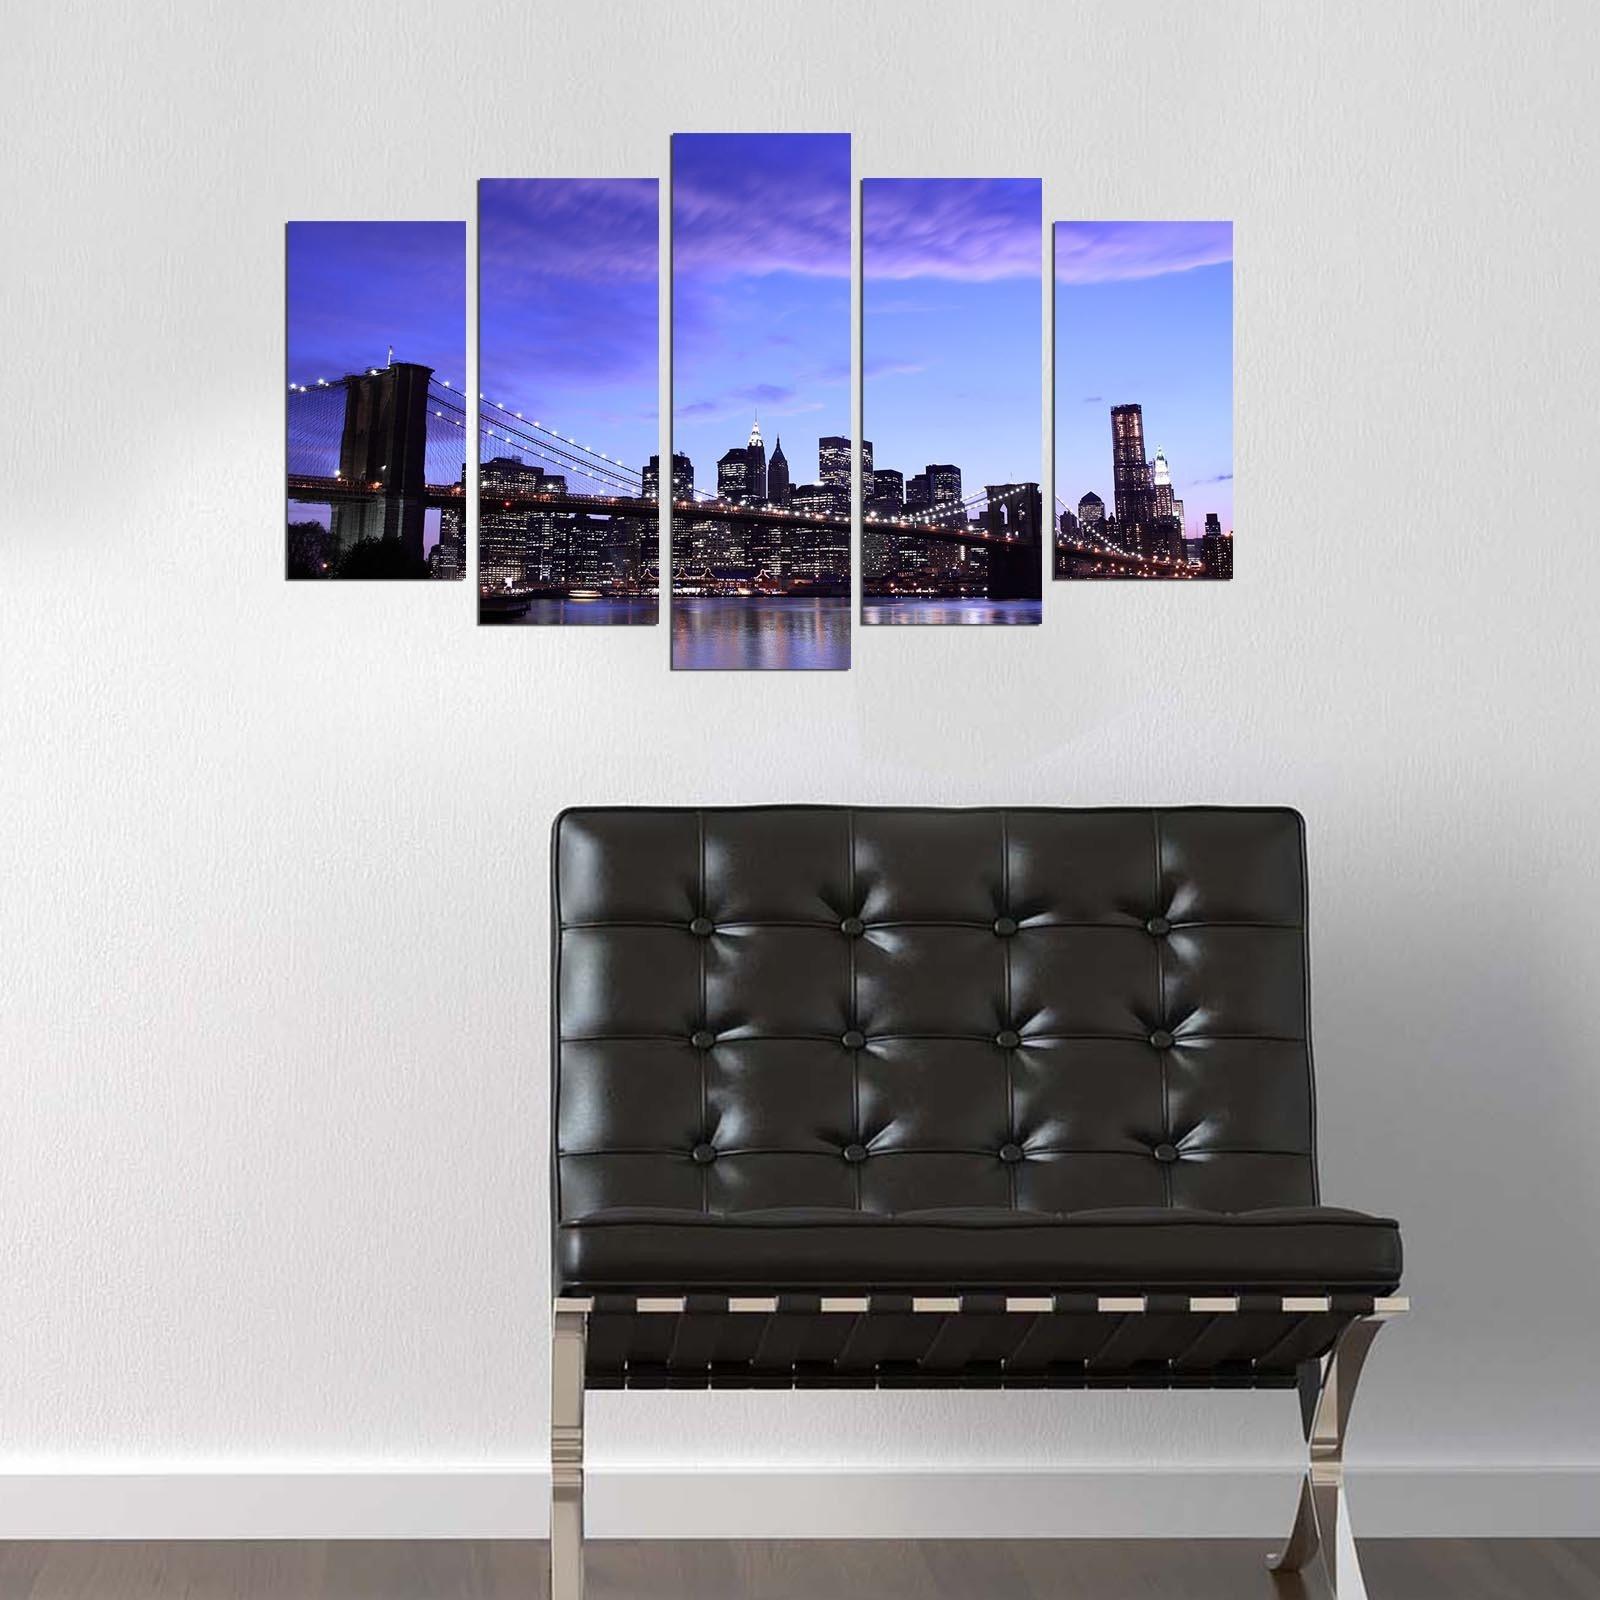 LaModaHome Decorative 100% MDF Wall Art 5 Panels (43'' x 24'' Total) Ready to Hang Painting Brooklyn America Night Light Bridge Building